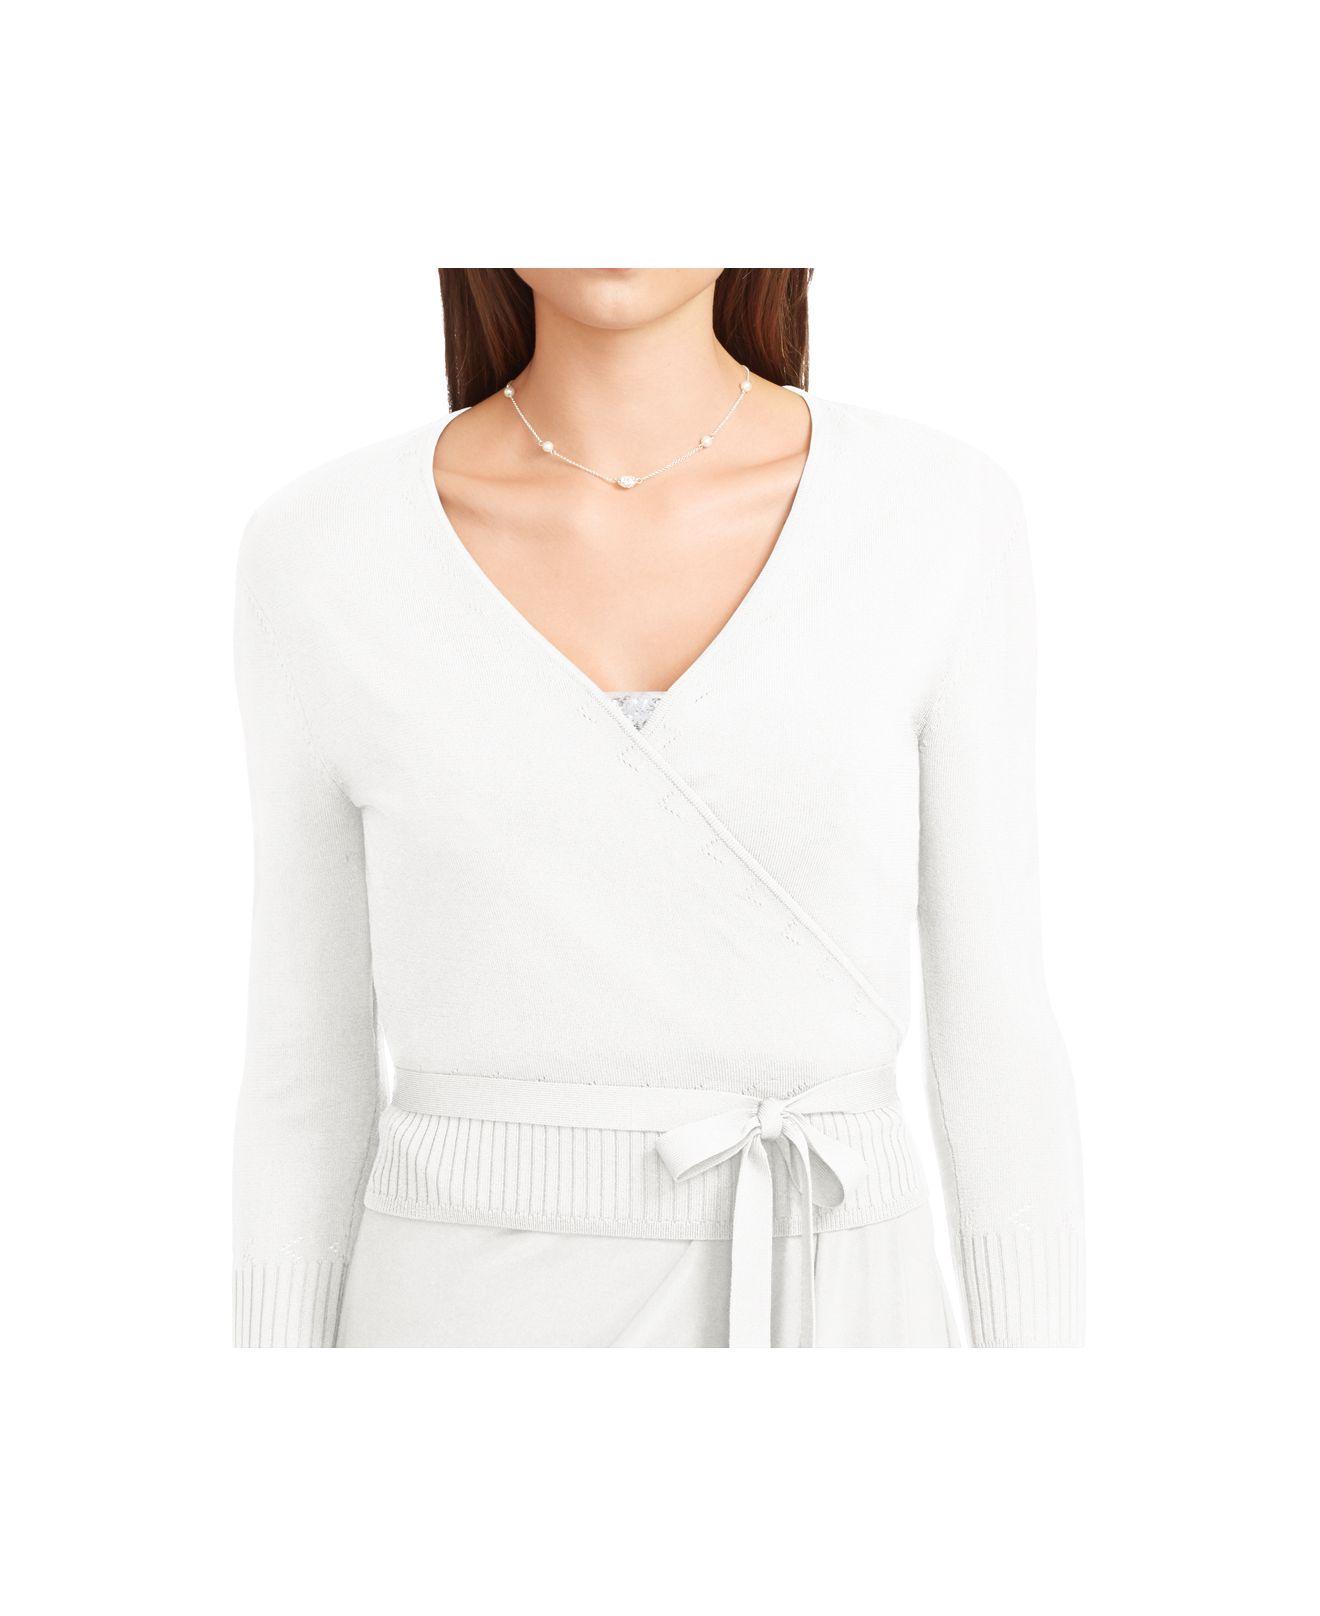 Lauren by ralph lauren Wrap Cardigan in White | Lyst